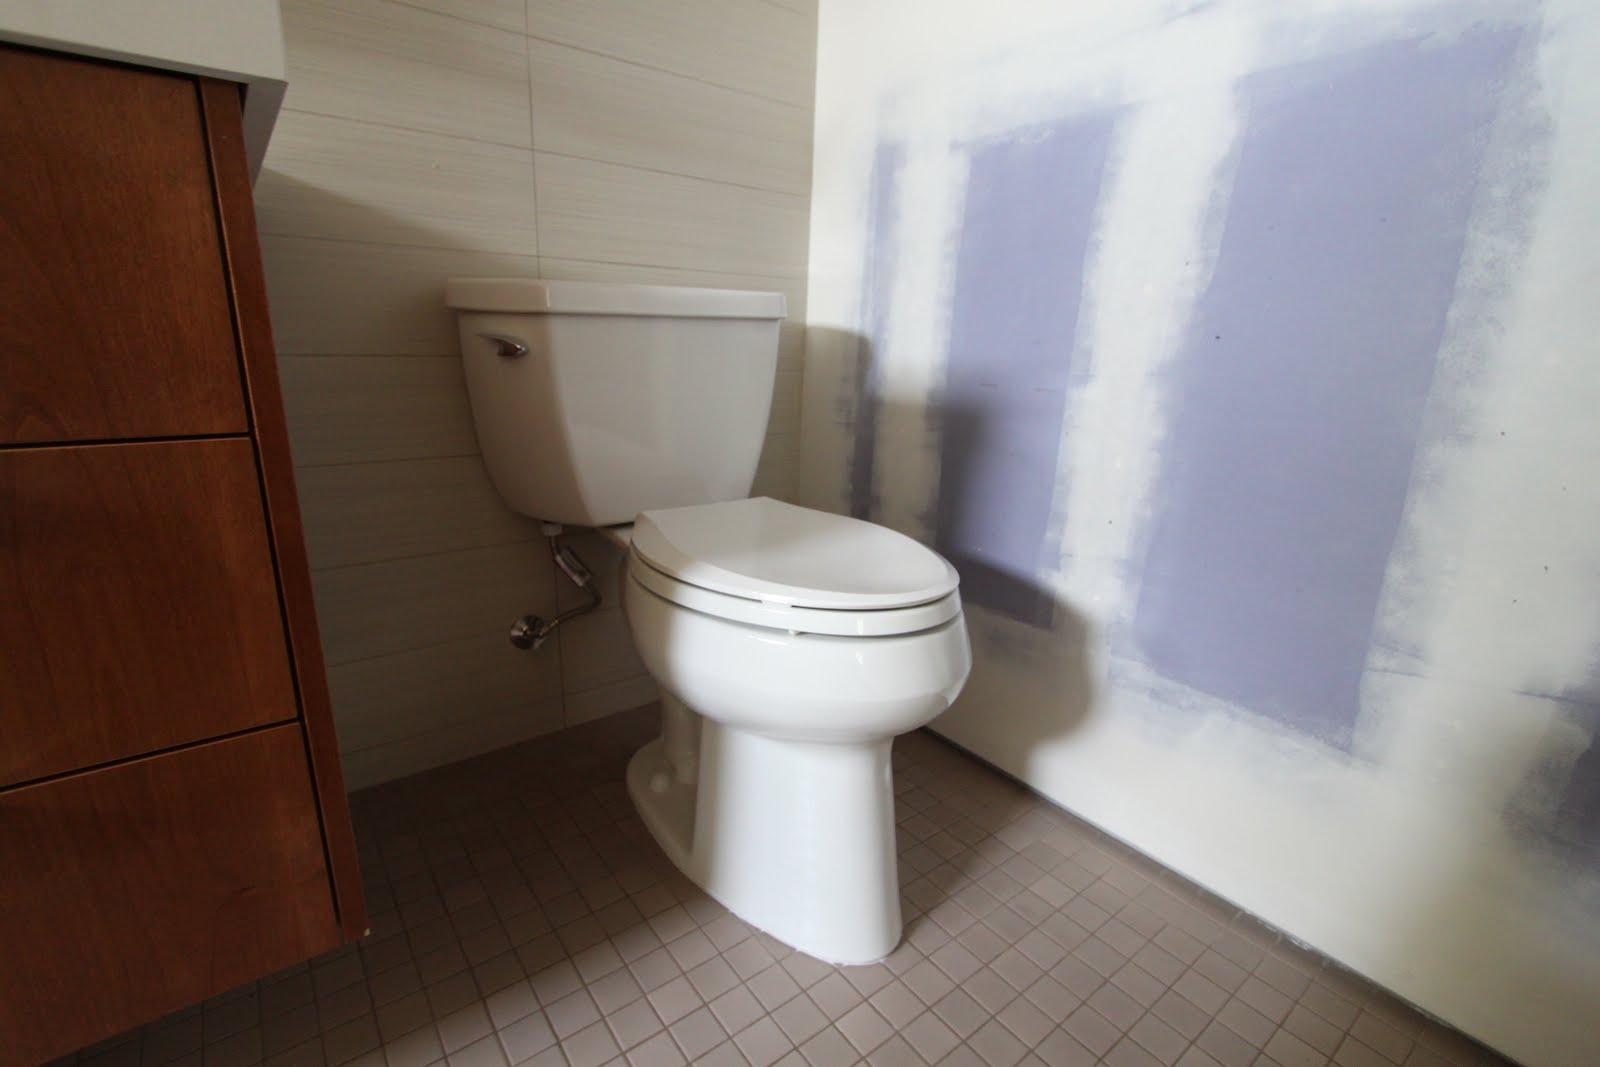 kohler wellworth classic pressure lite elongated toilet